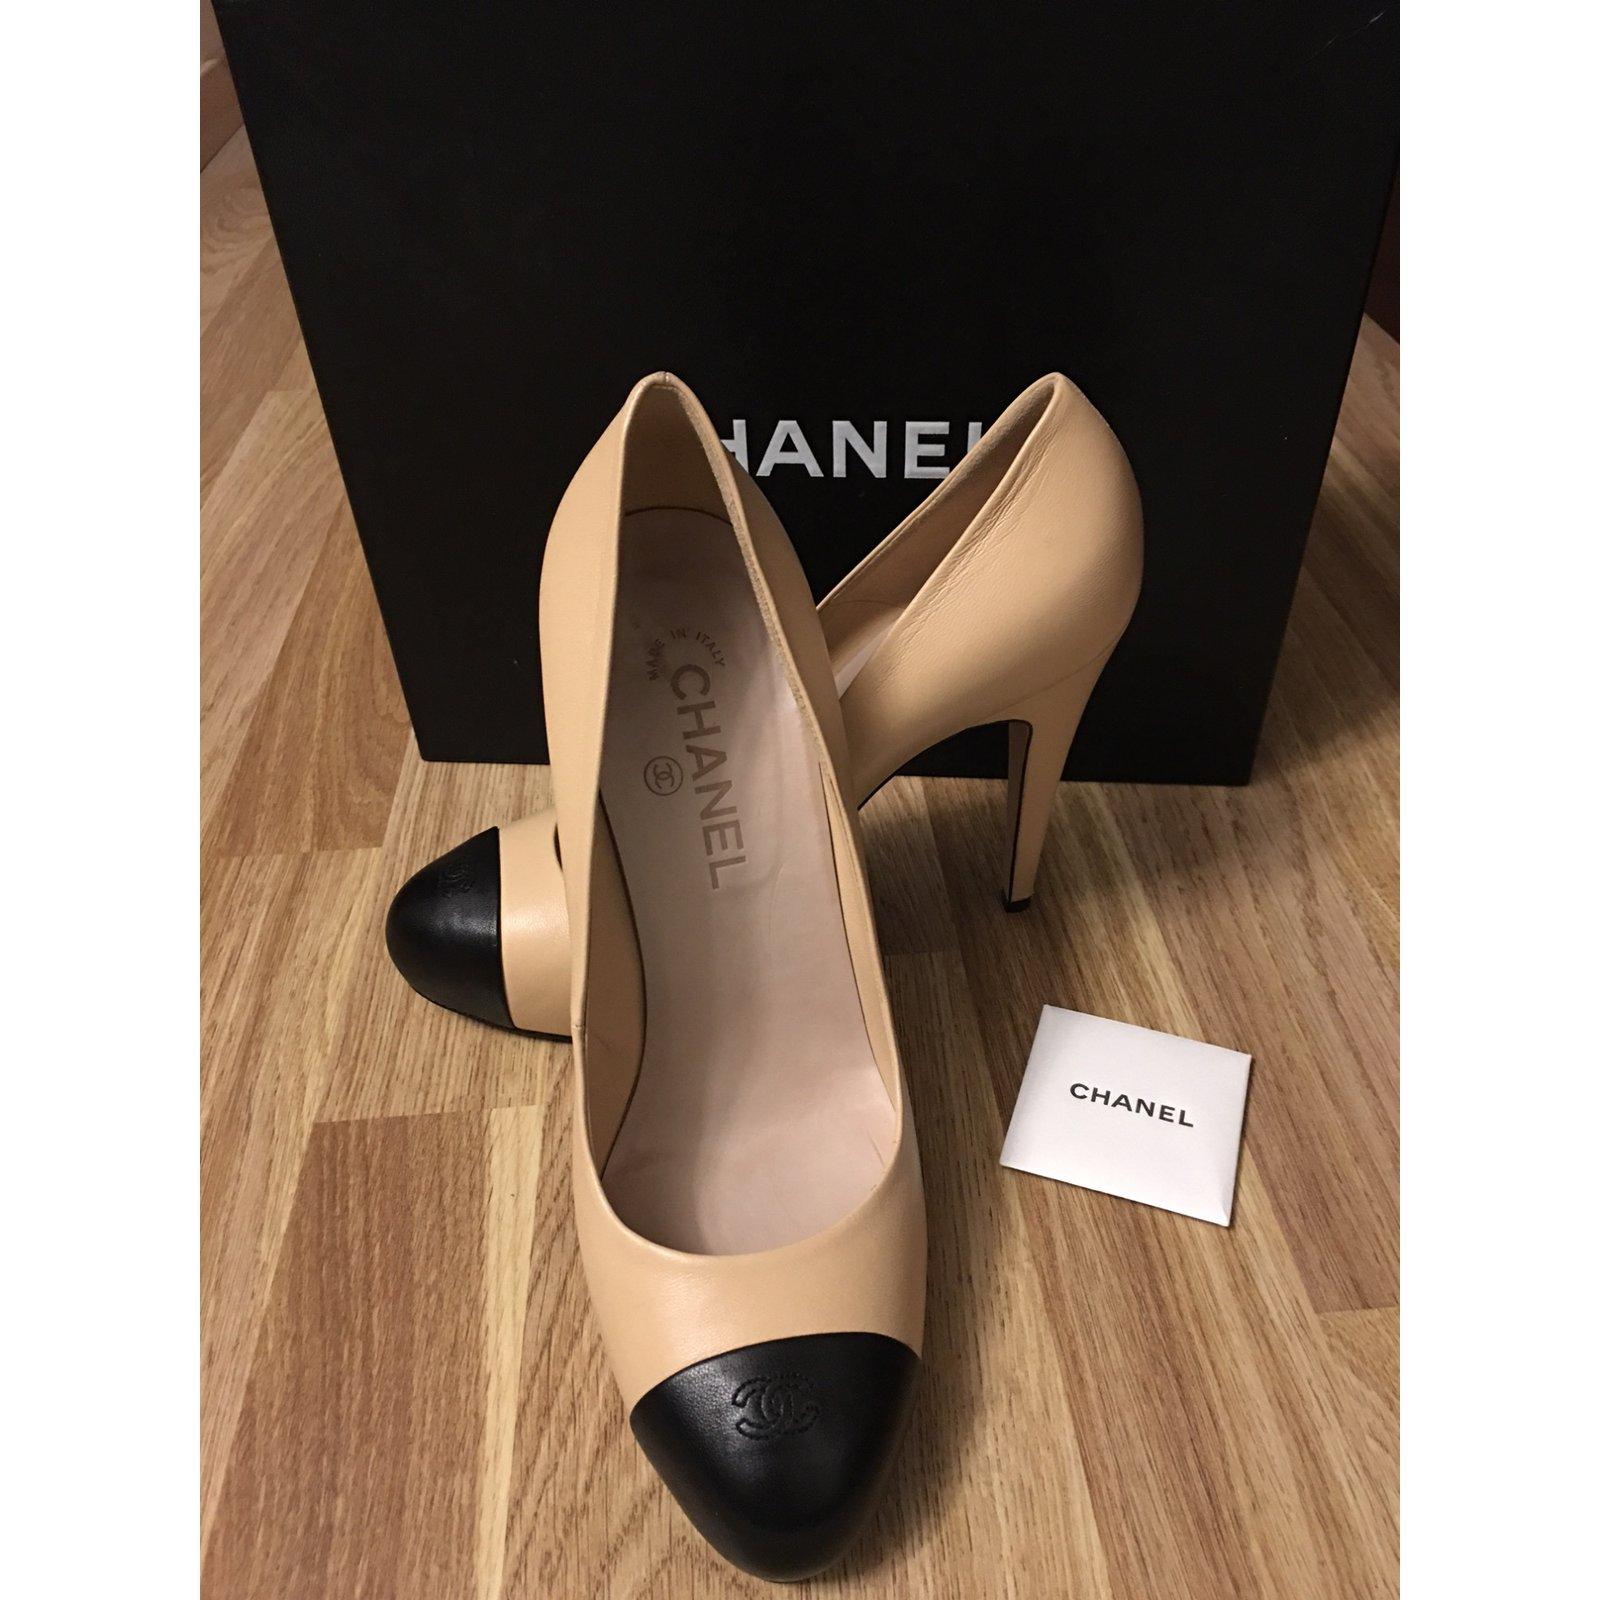 Escarpins Chanel Escarpins Cuir Noir Beige Ref 34287 Joli Closet